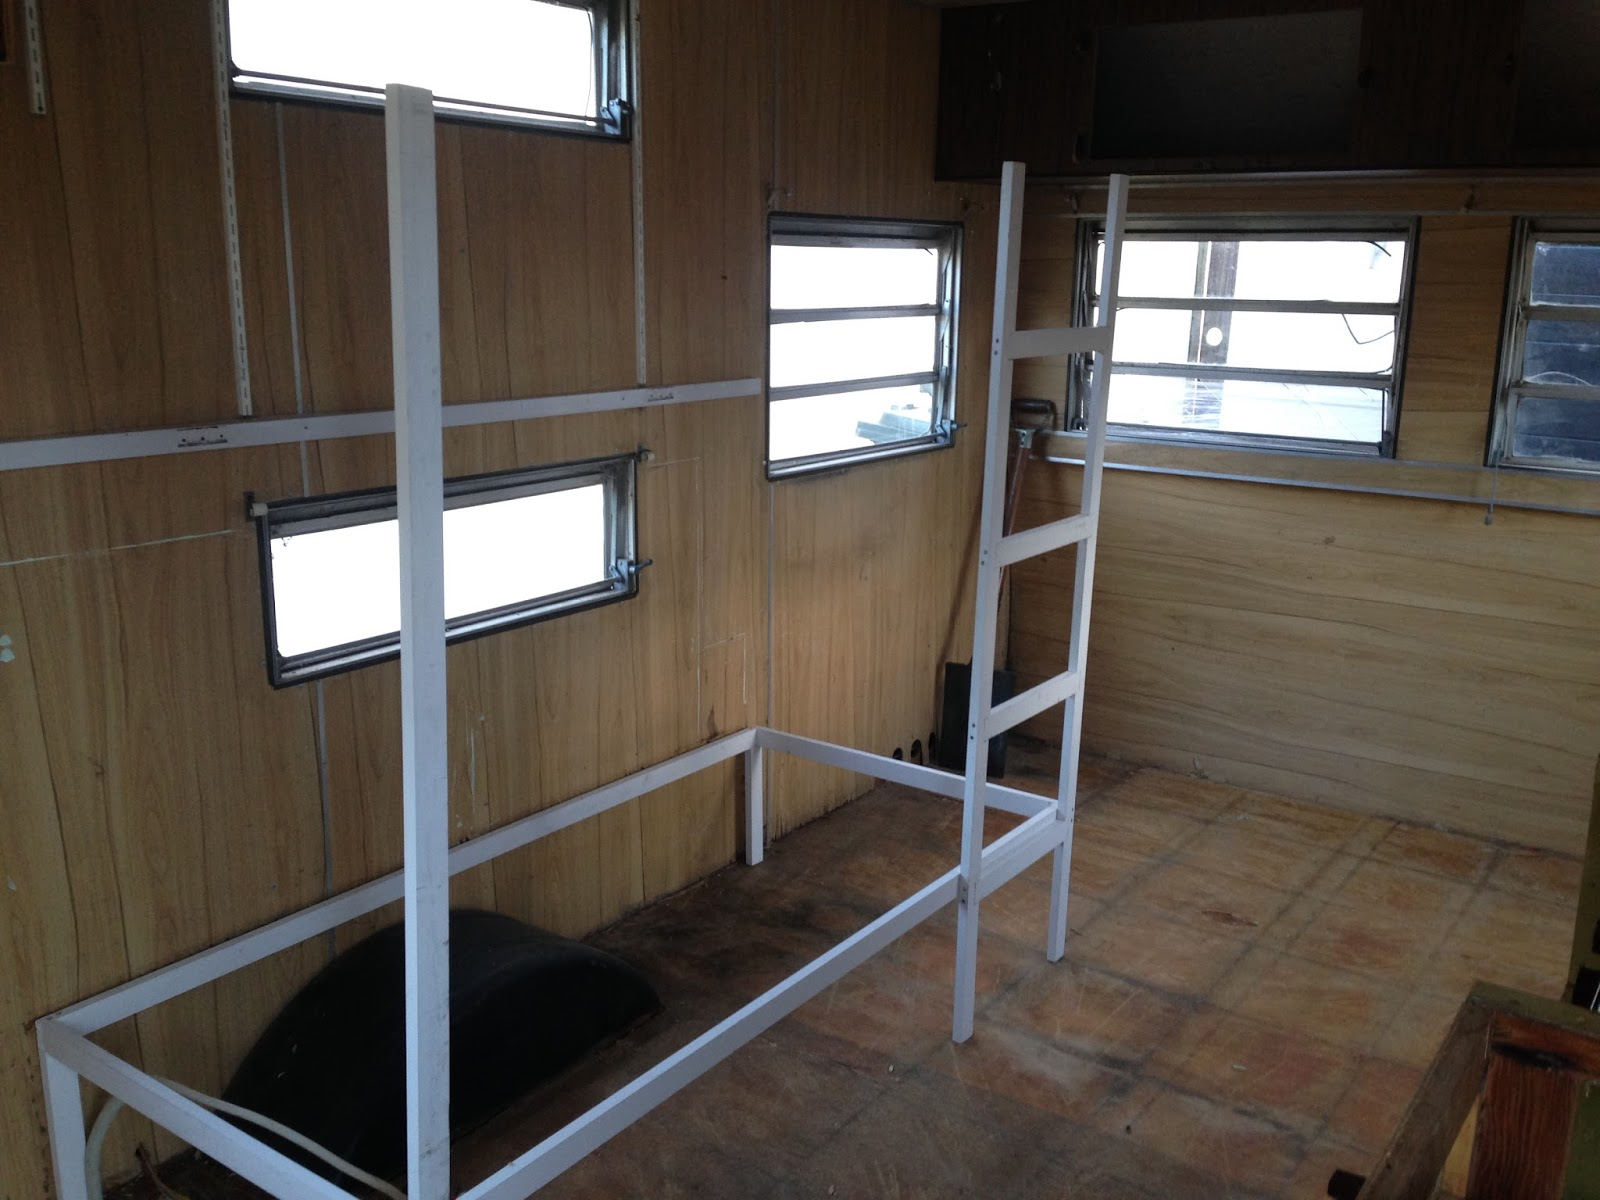 Organising the four of us: Restoring an old caravan